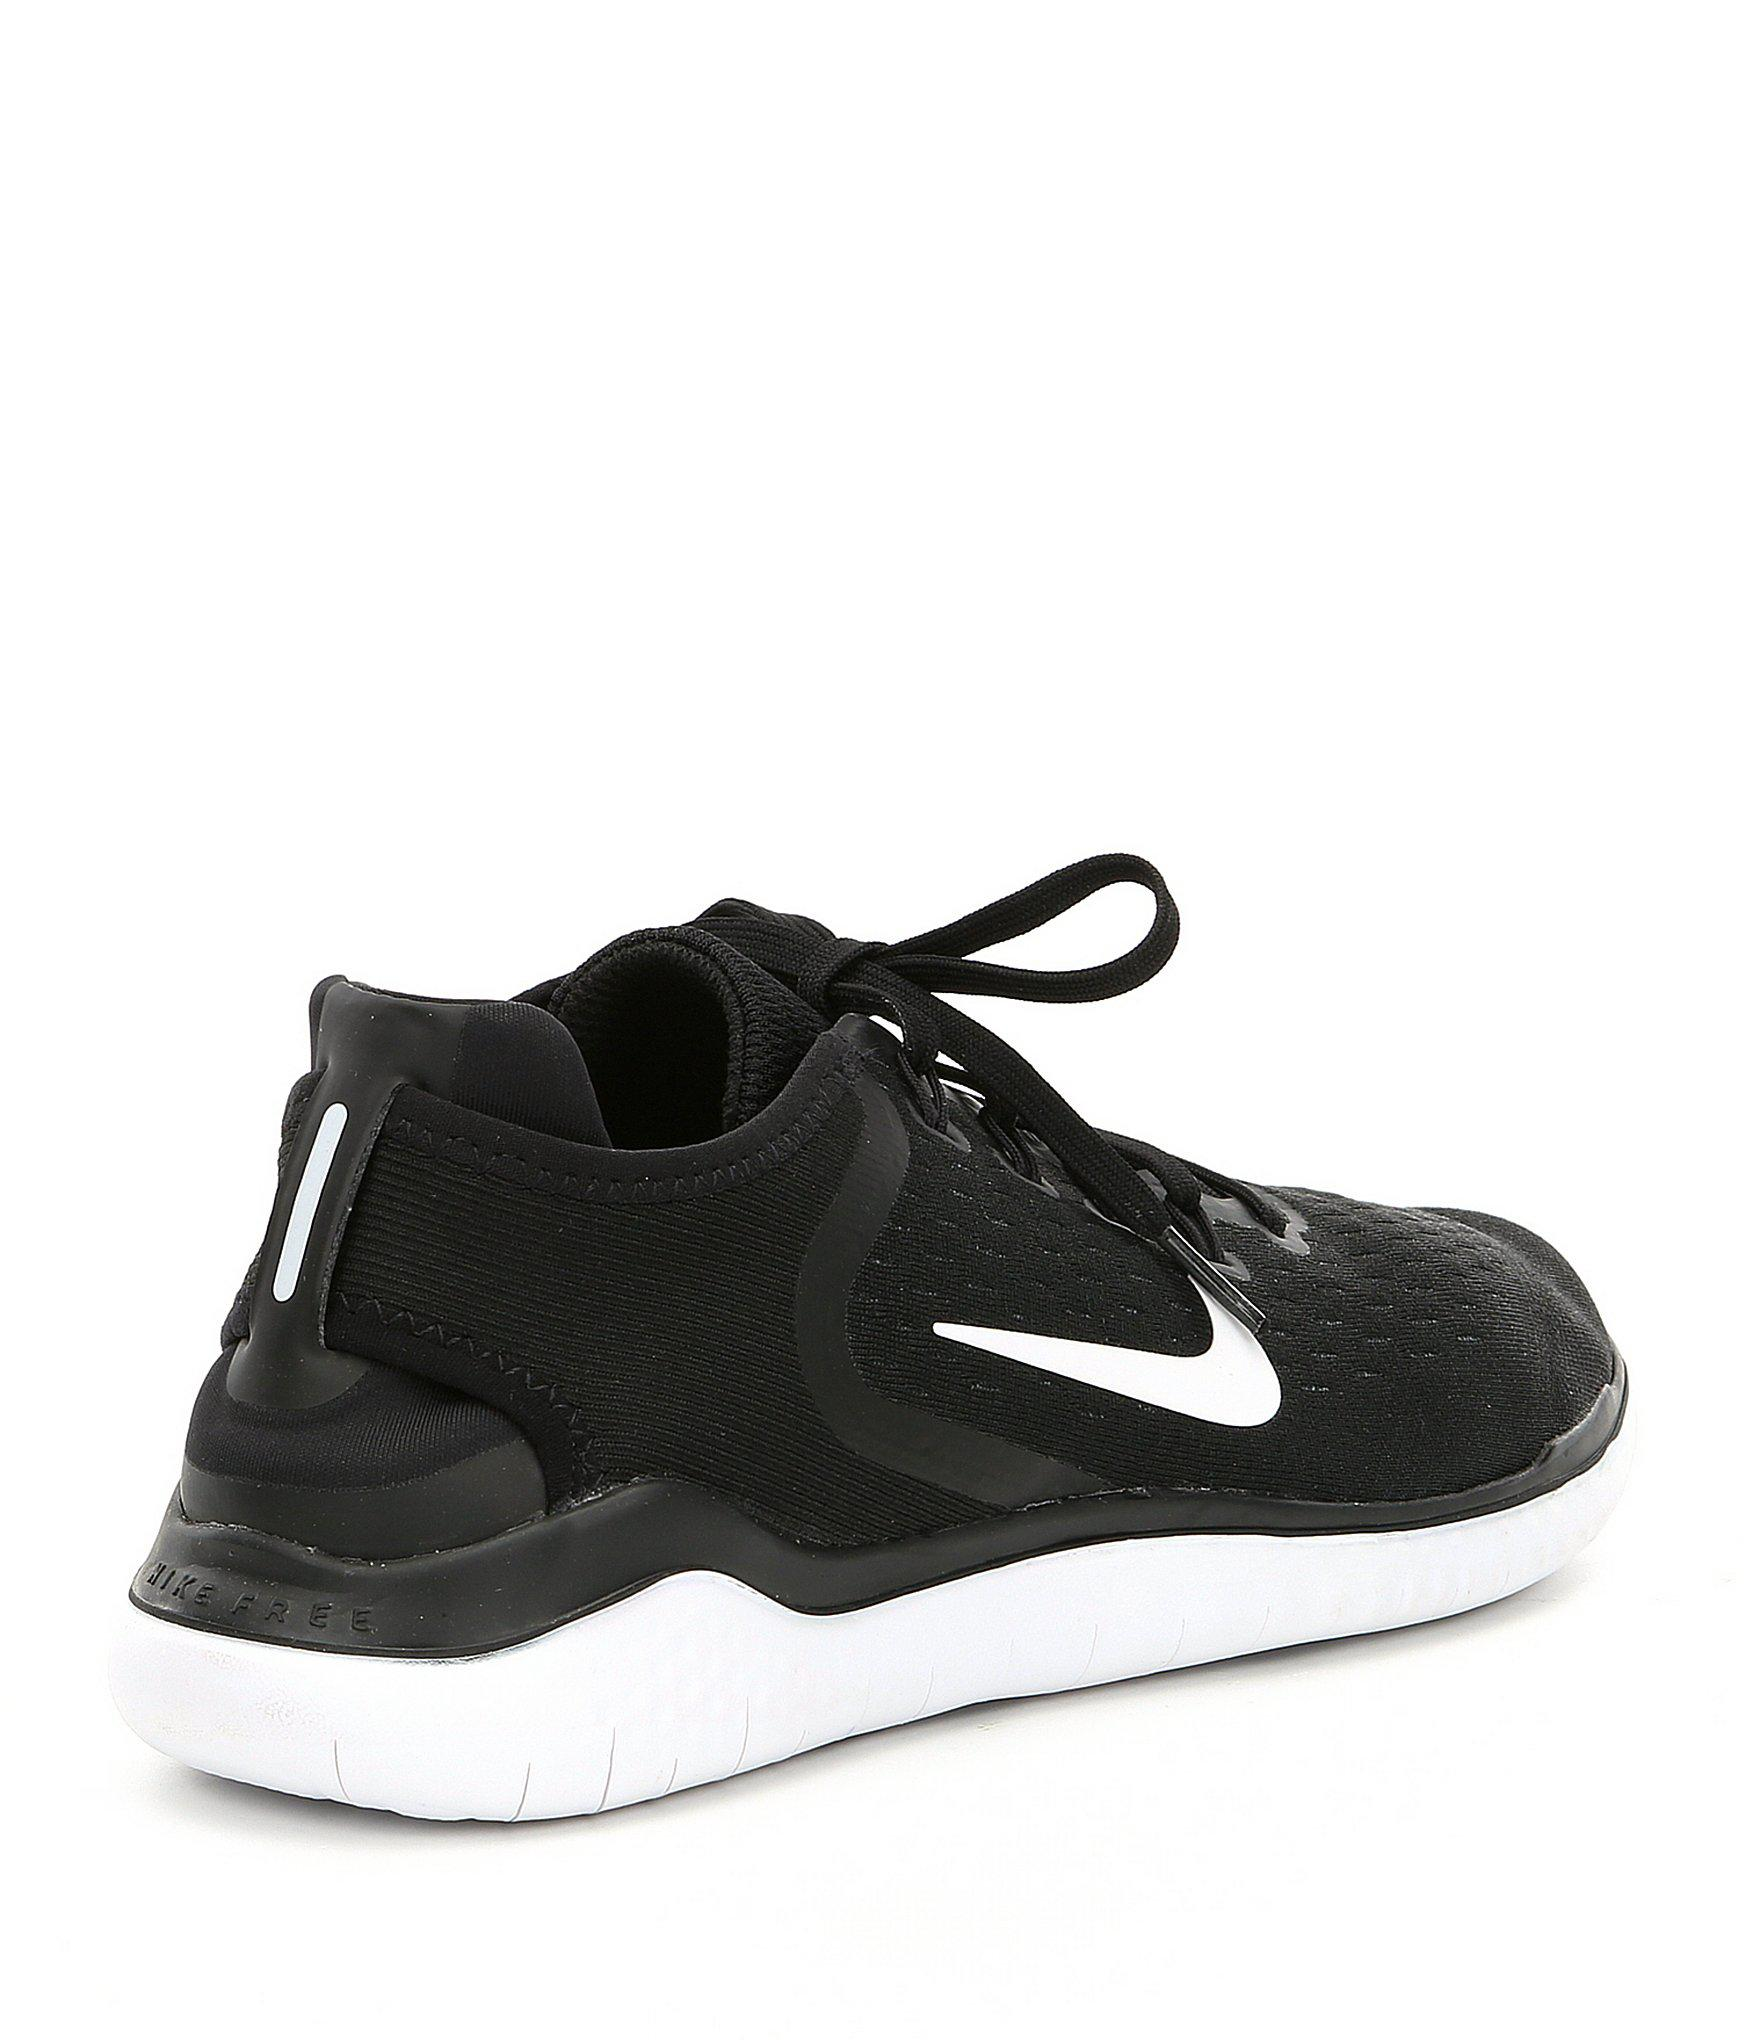 0dd36f5ff91ec Nike - Black Men s Free Rn 2018 Running Shoes for Men - Lyst. View  fullscreen